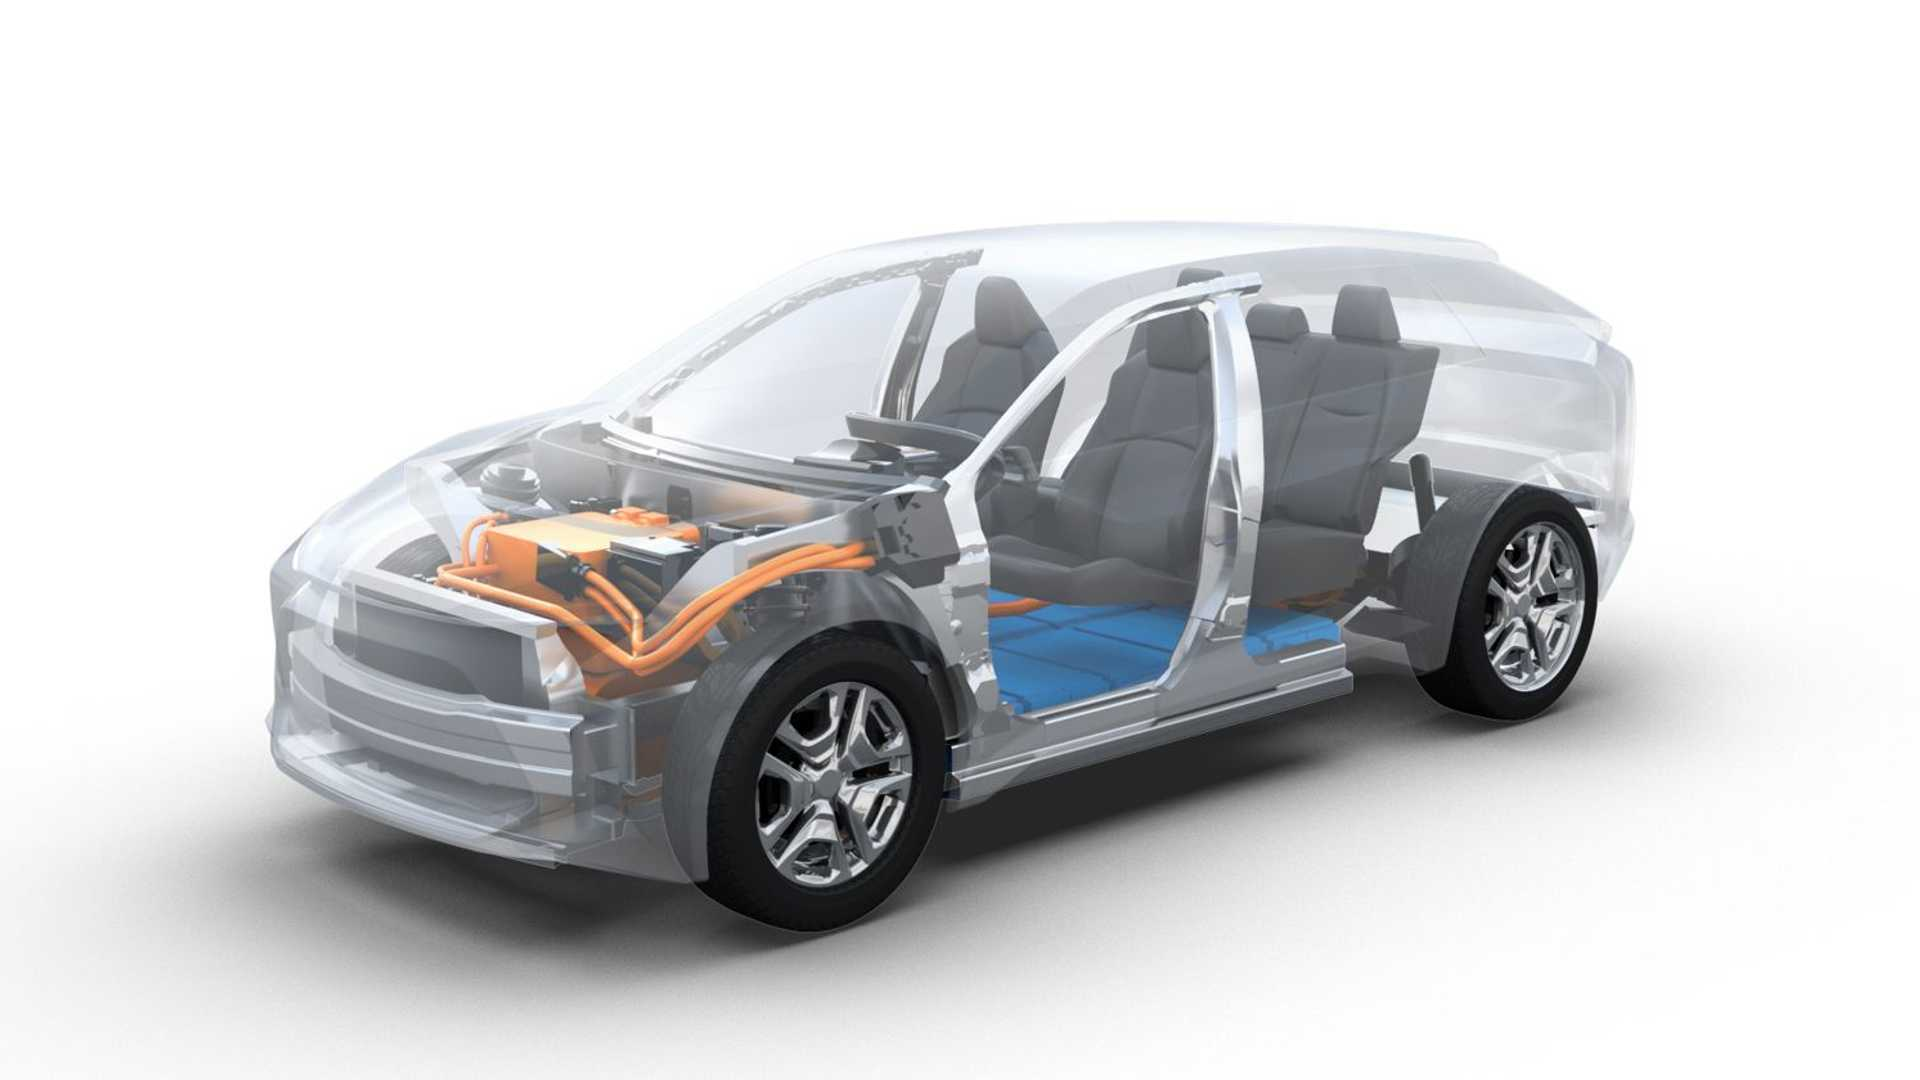 Toyota Nuevo Suv Electrico 1220 02